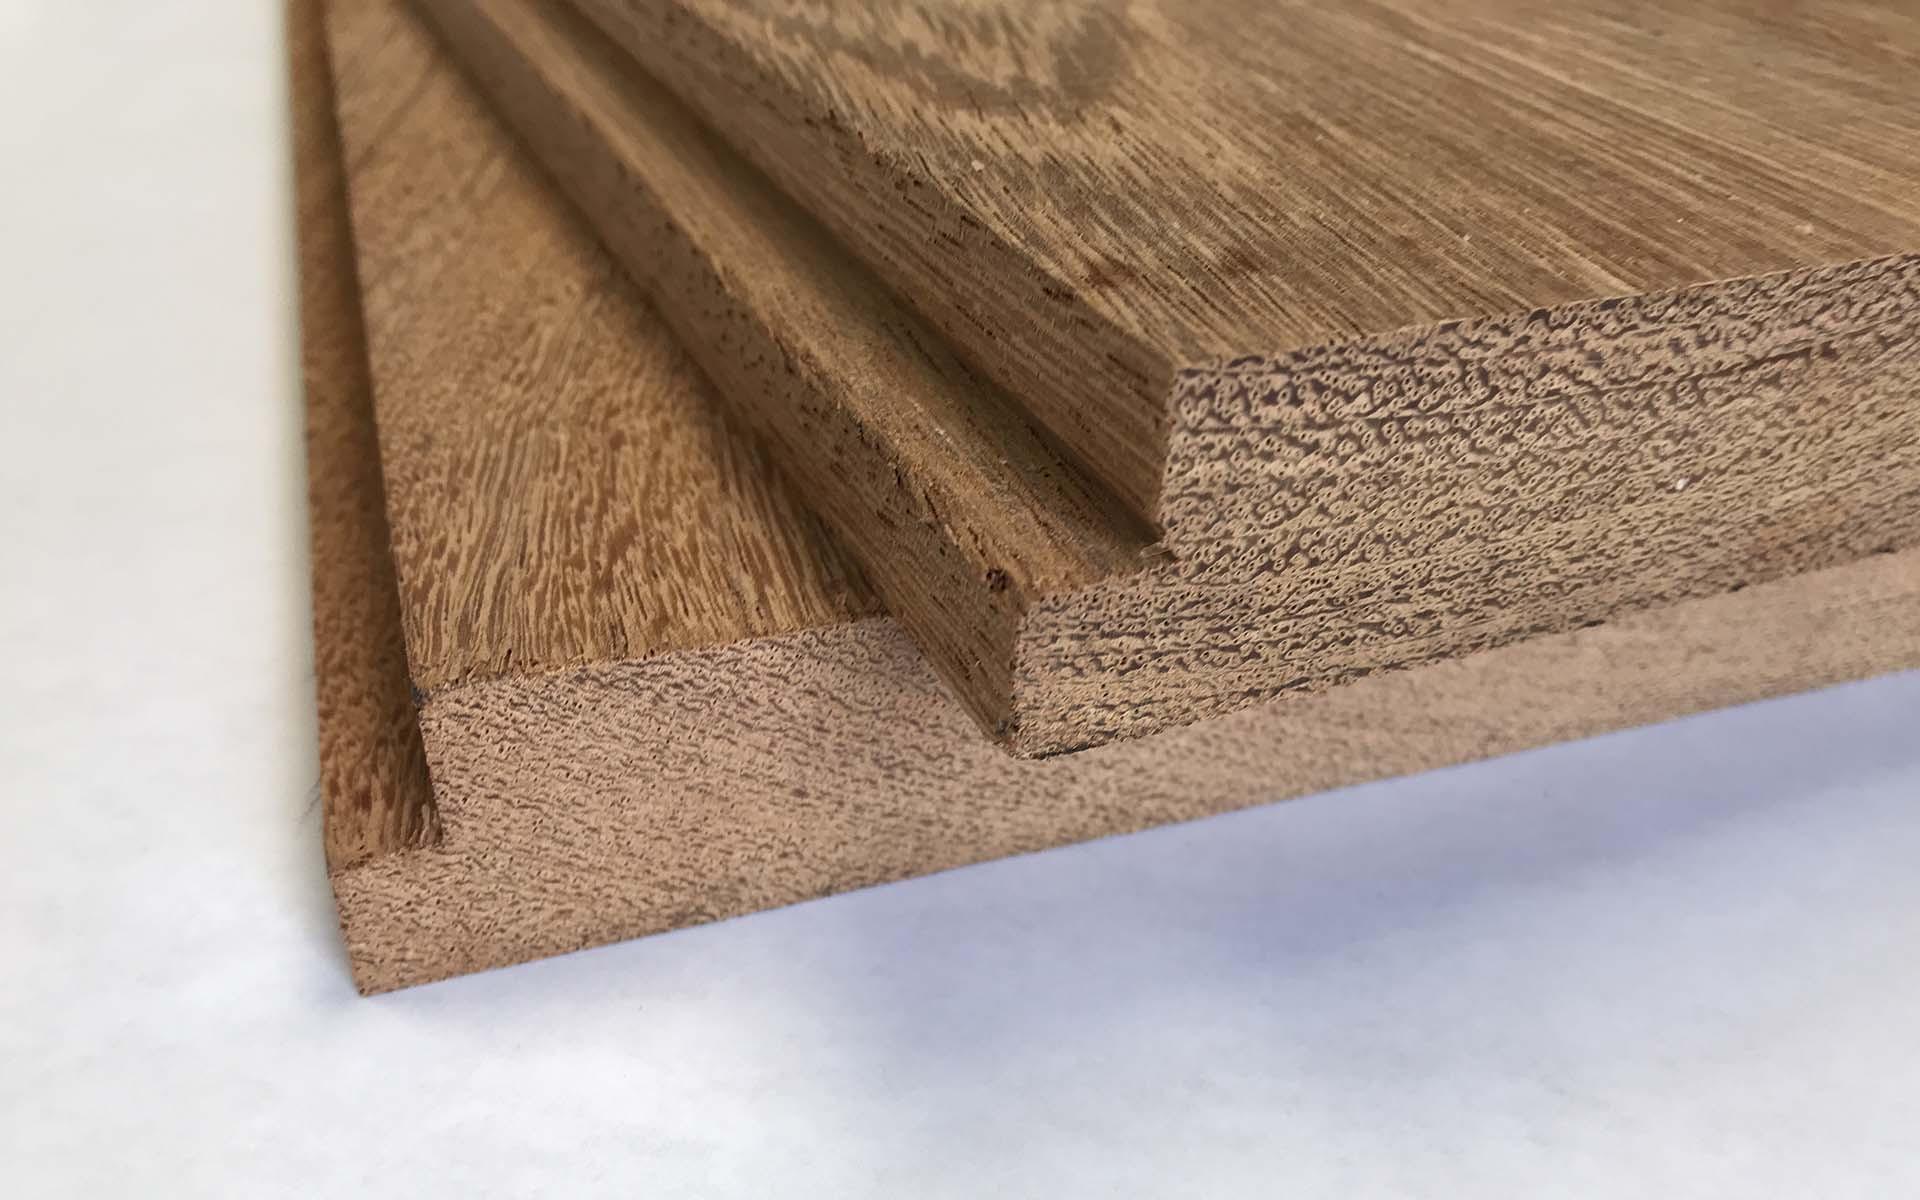 hardwood flooring stapler for sale of buy trailer decking apitong shiplap rough boards truck flooring throughout 3 angelim pedra shiplap close up